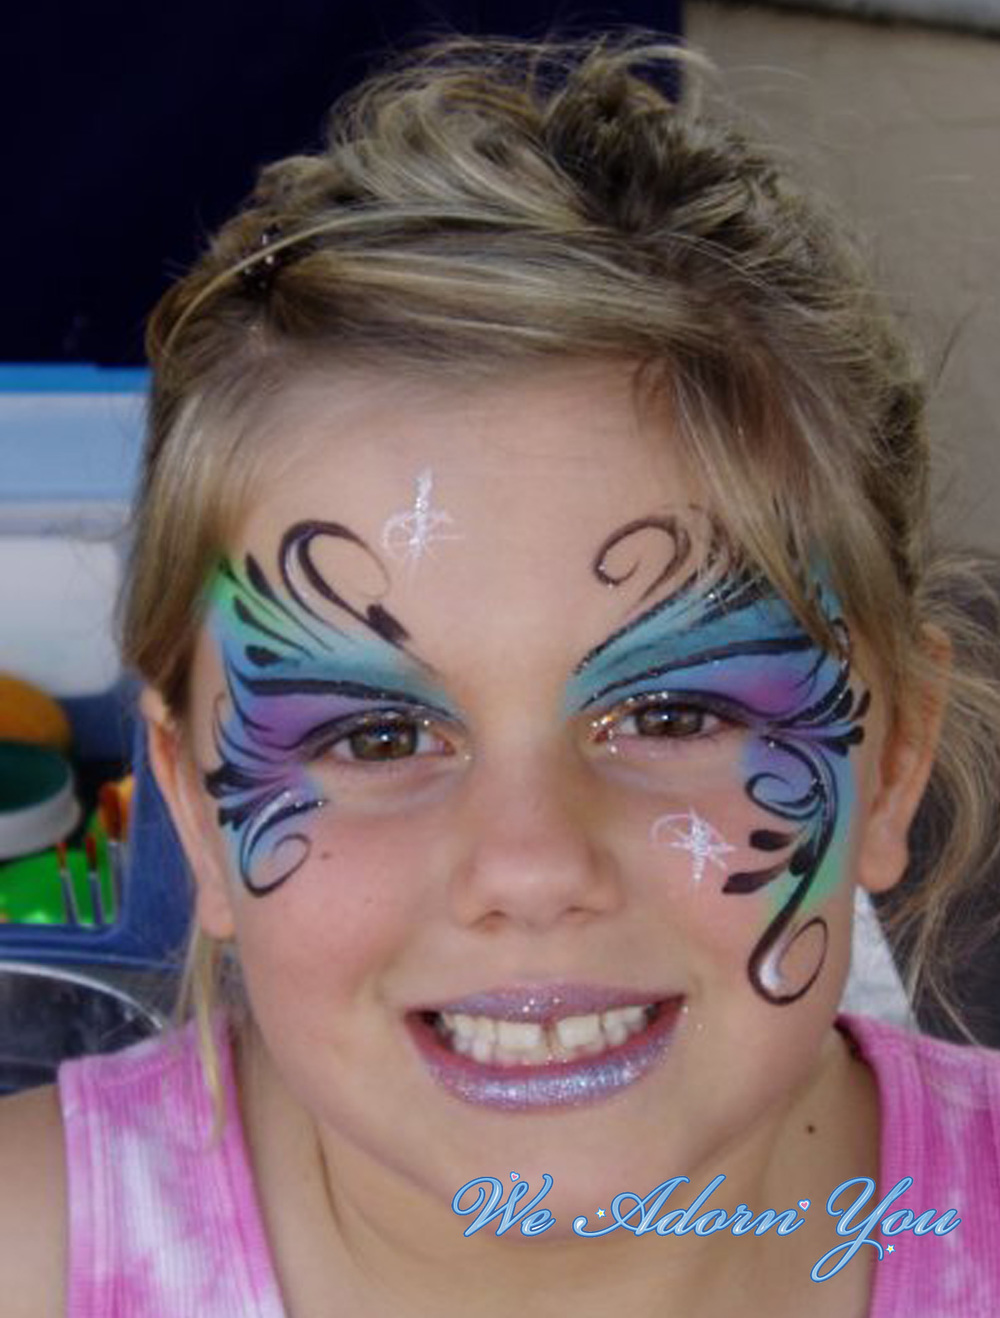 Face Painting Eye Design - We Adorn You.jpg